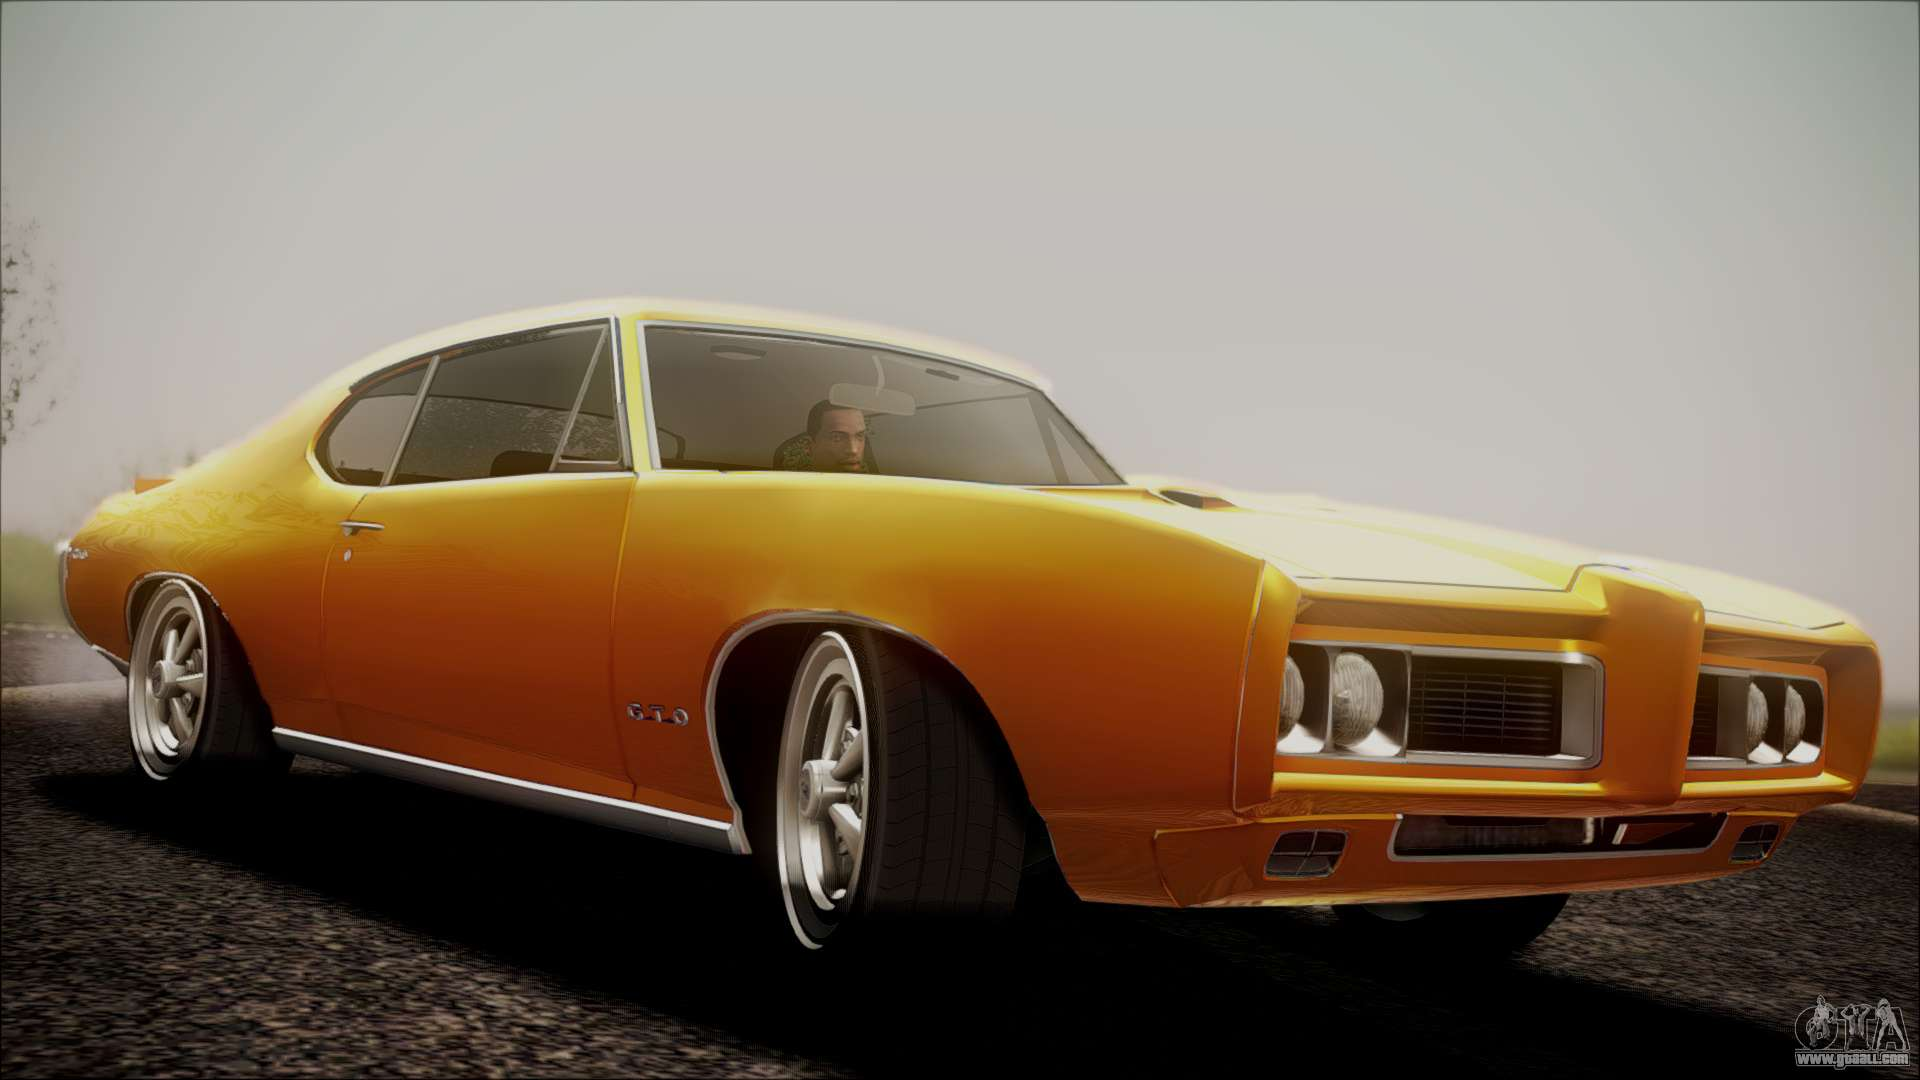 gta gto pontiac 1968 andreas san sa mod cars gtaall